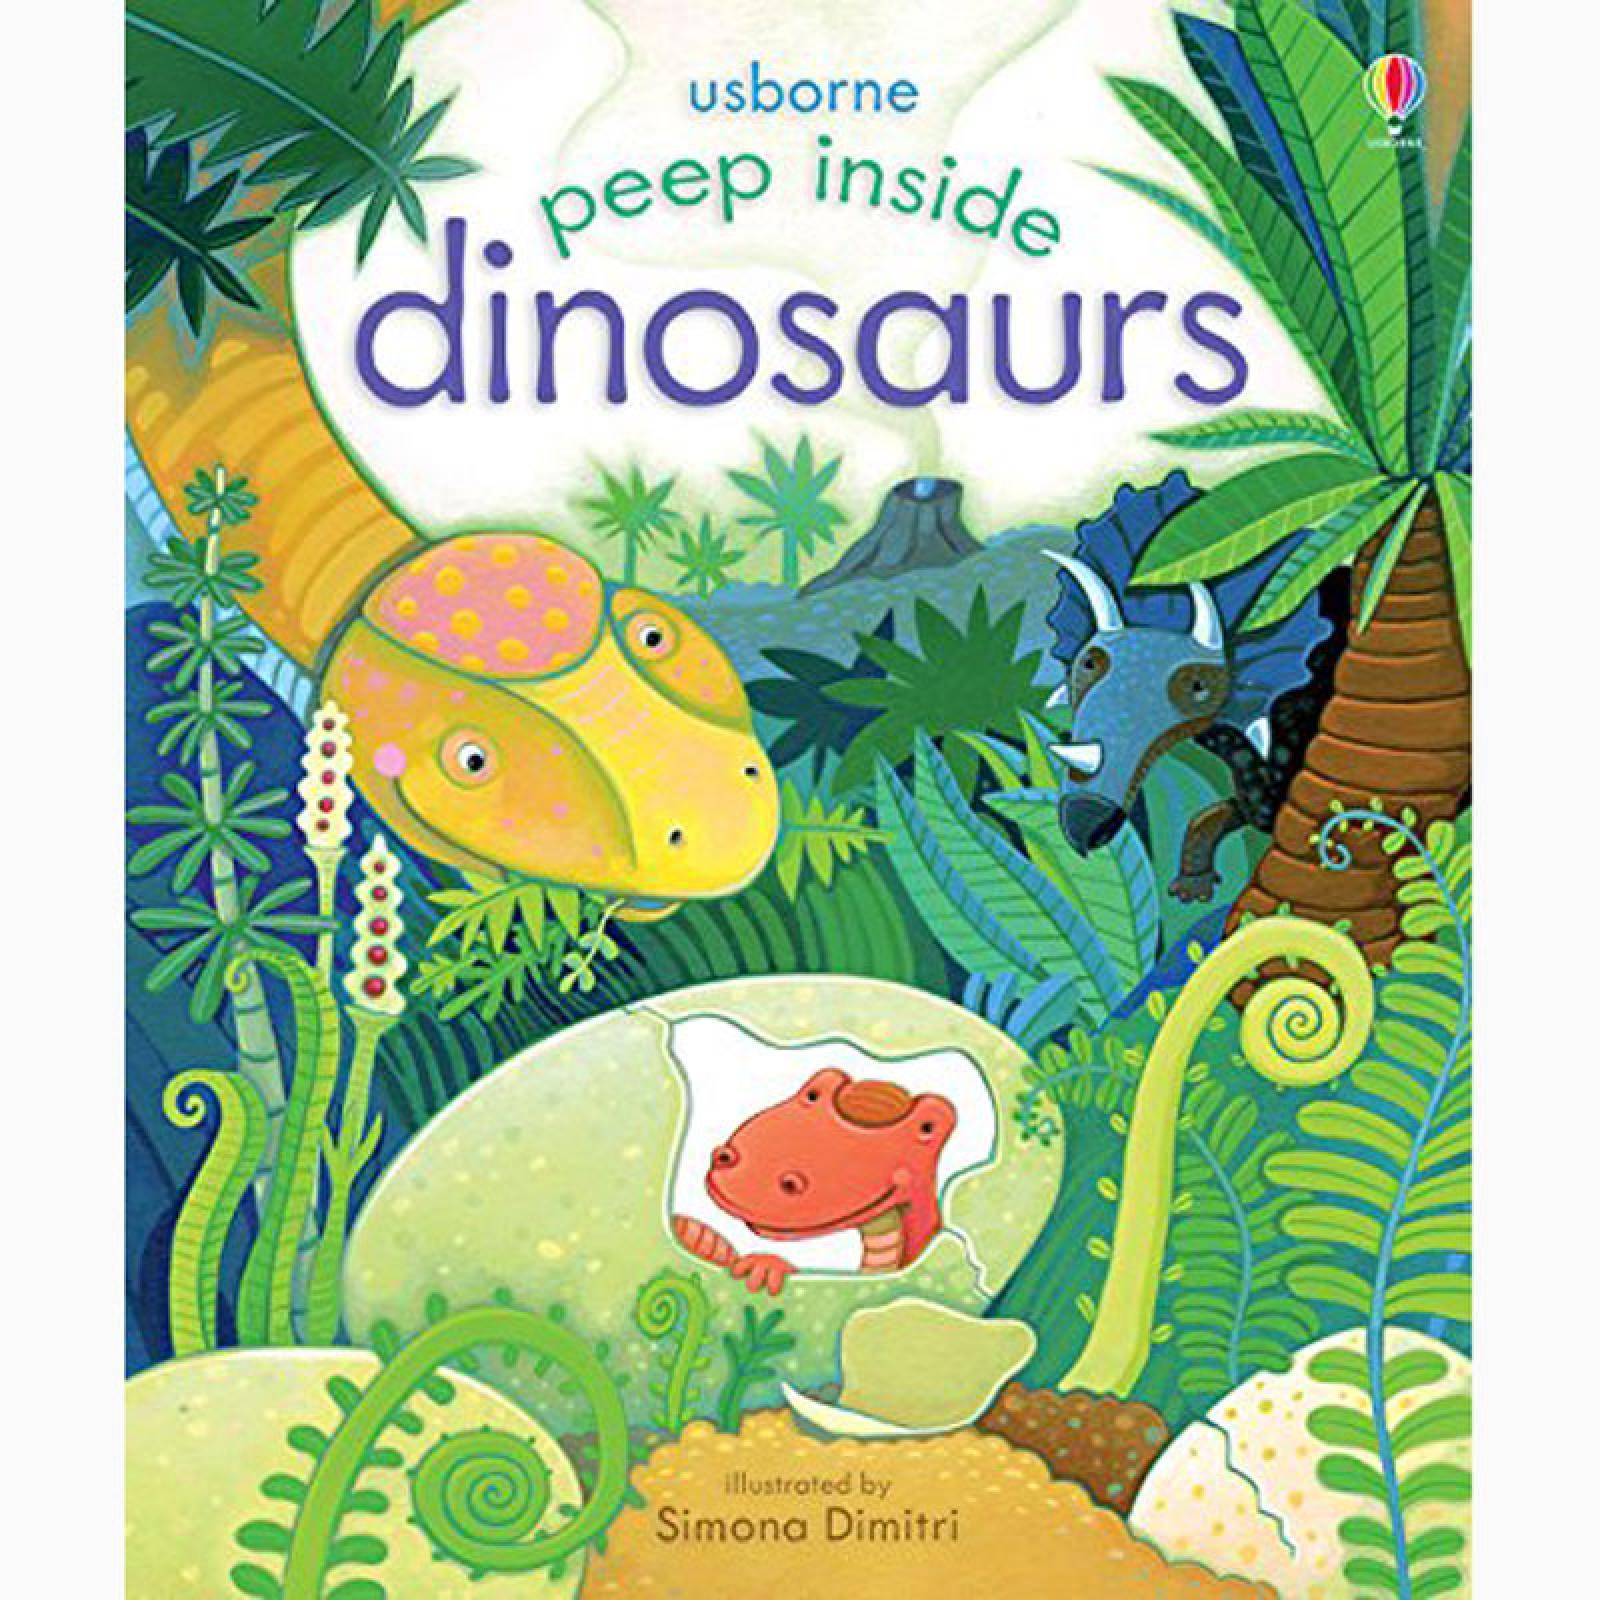 Peep Inside Dinosaurs (Lift The Flap Book)